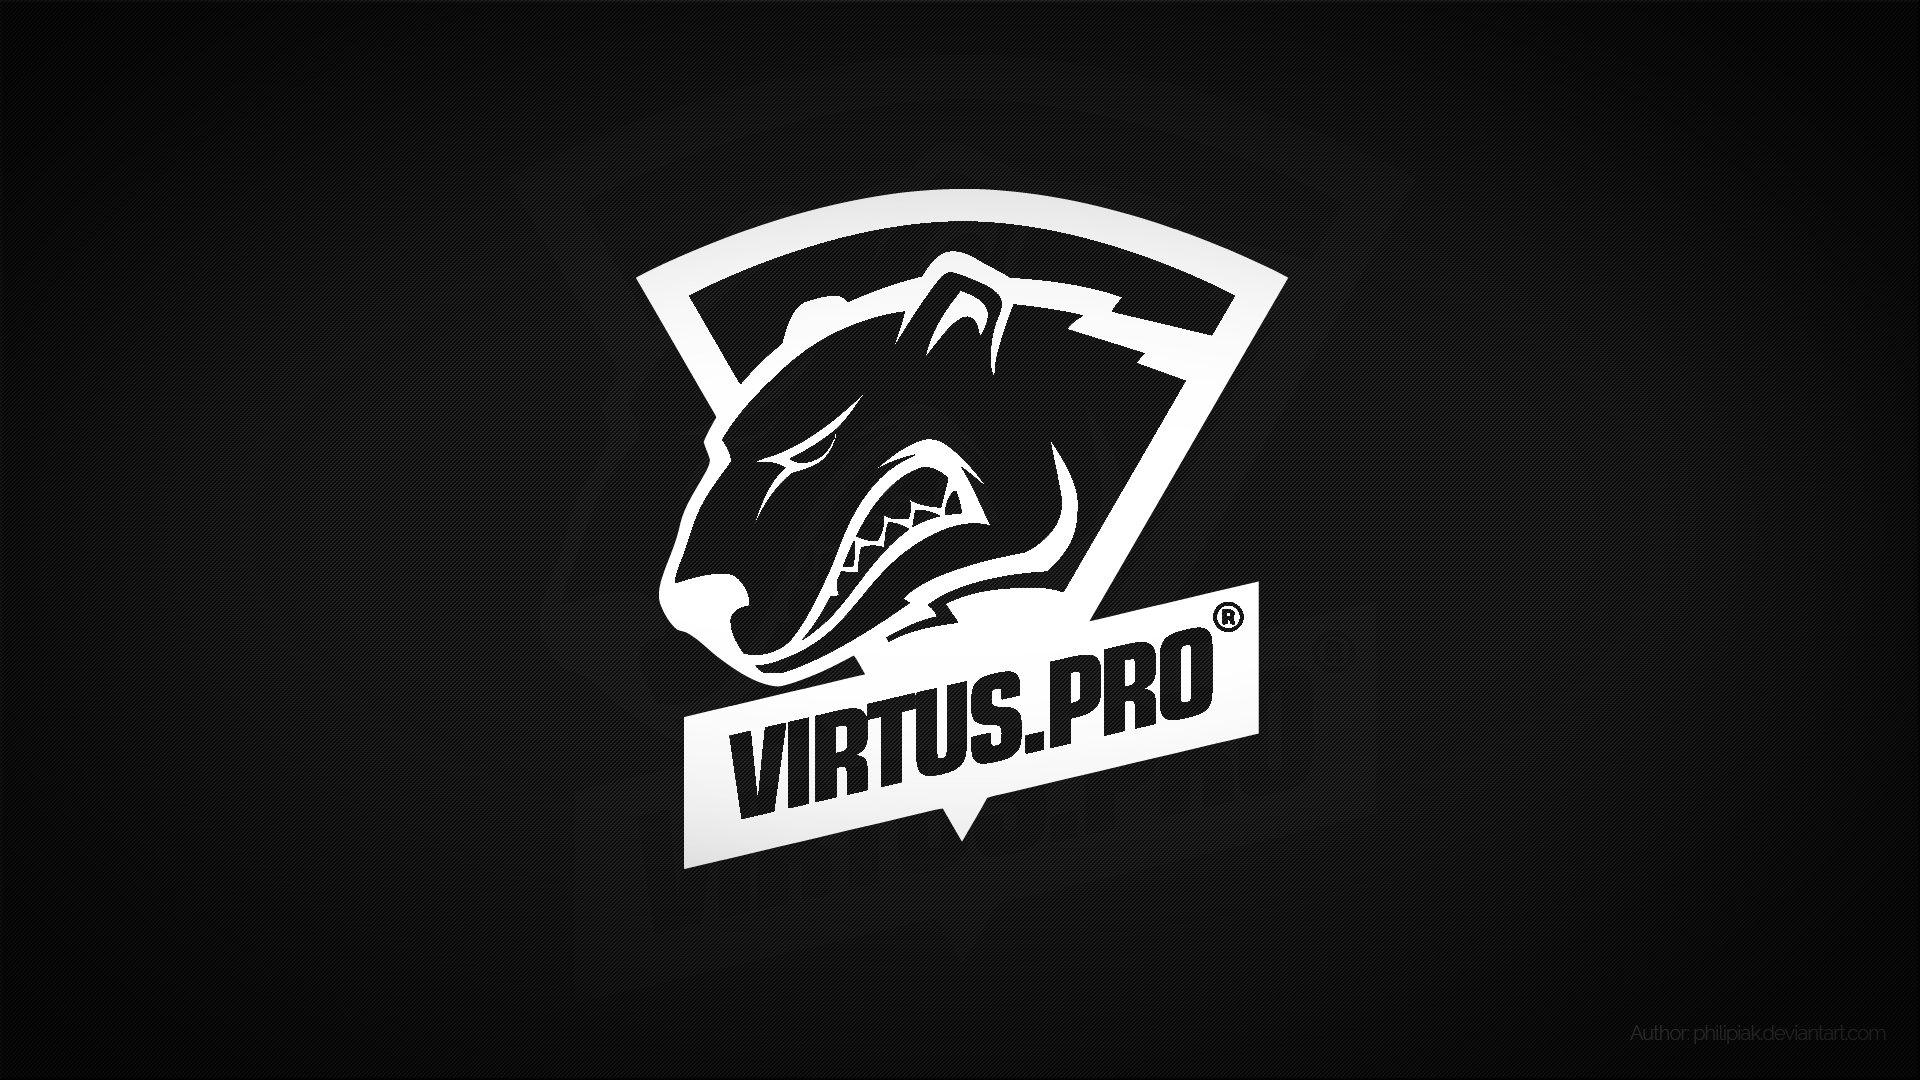 Video Game - eSports  Virtus.pro Gaming Team Counter-Strike: Global Offensive Wallpaper